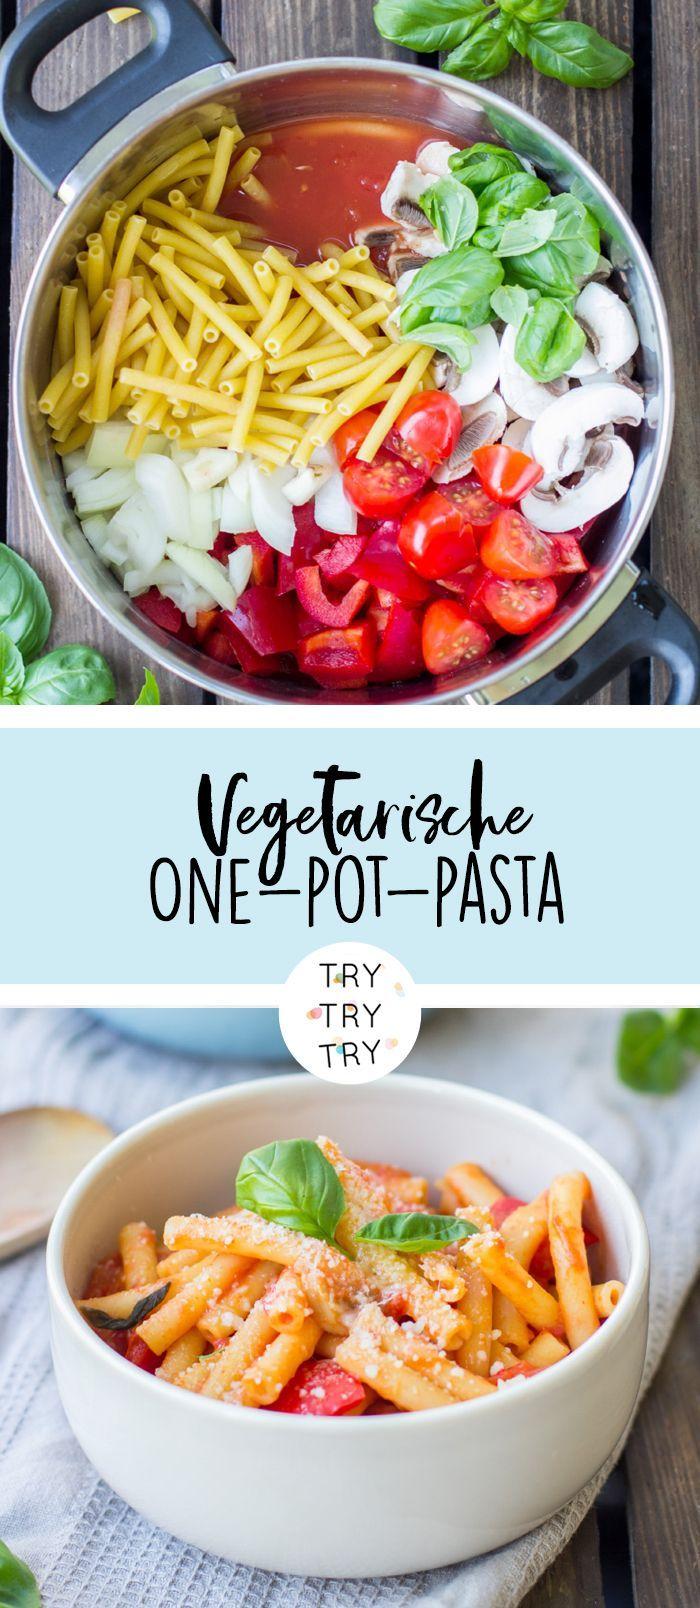 Photo of Vegetarische One-Pot-Pasta – New Ideas